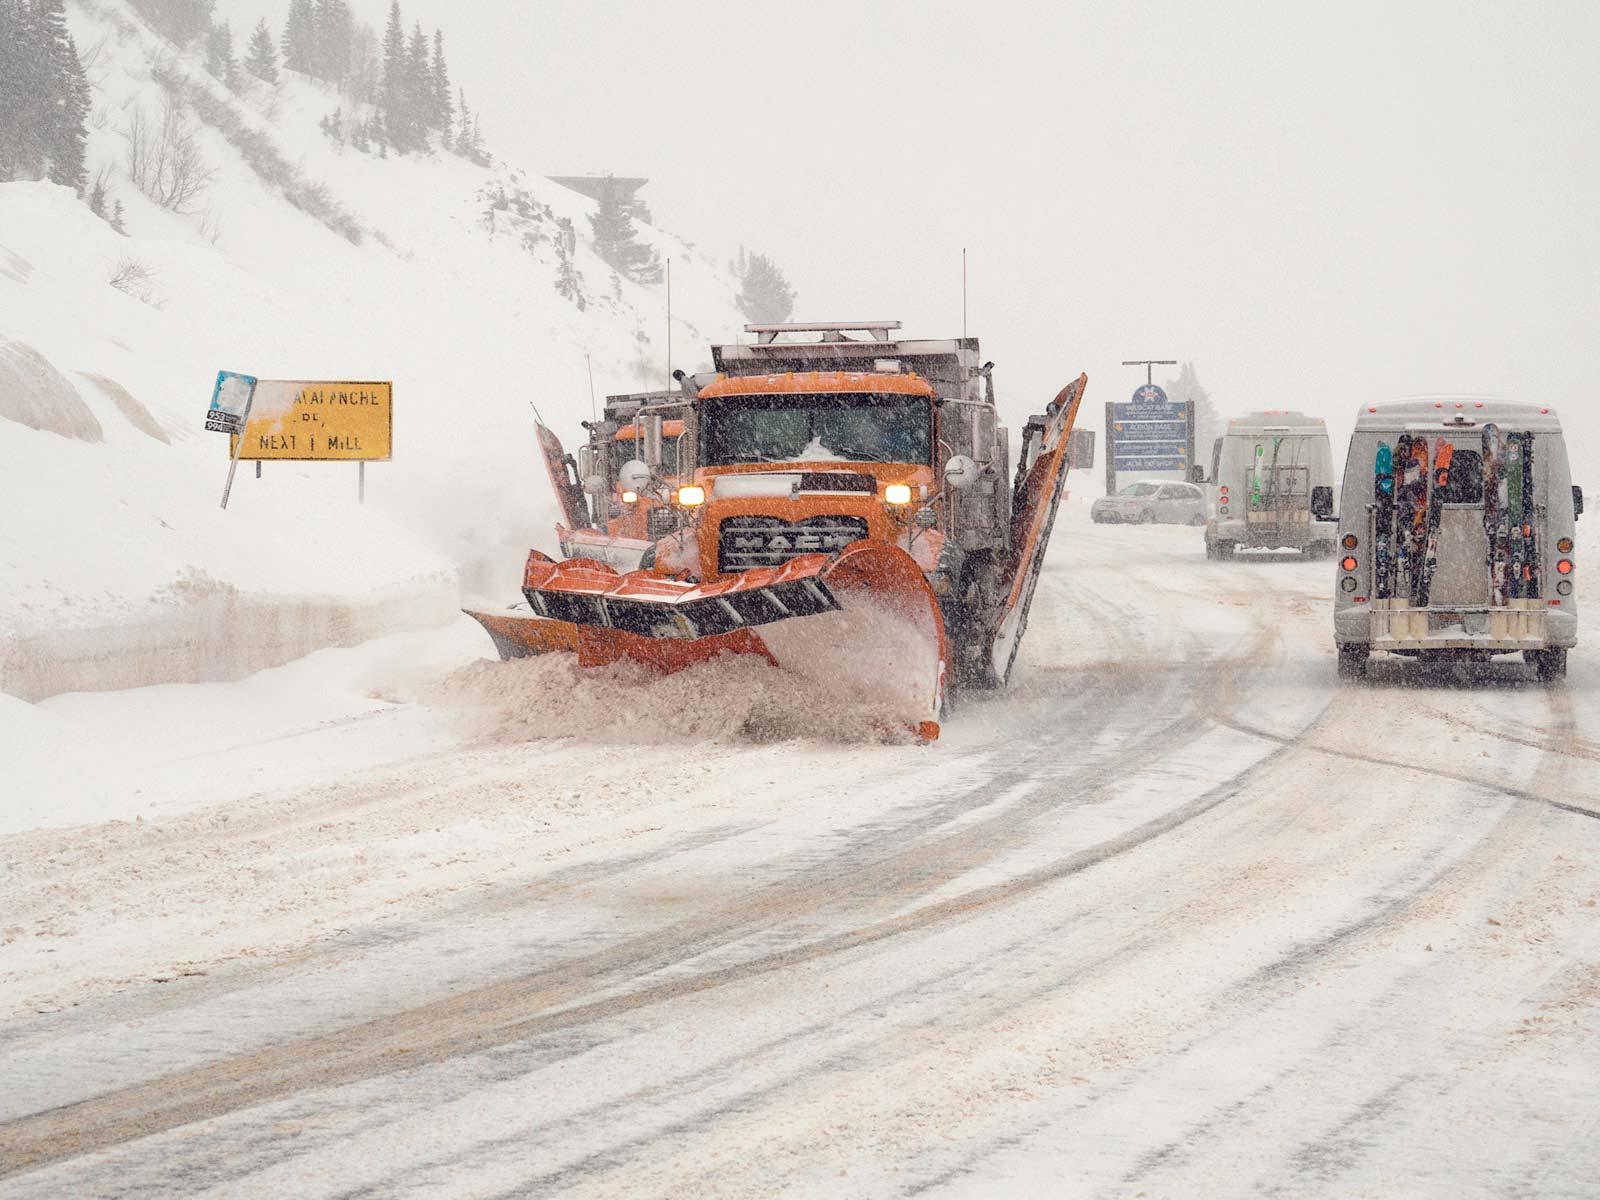 granite-tdot-snow-plow-2